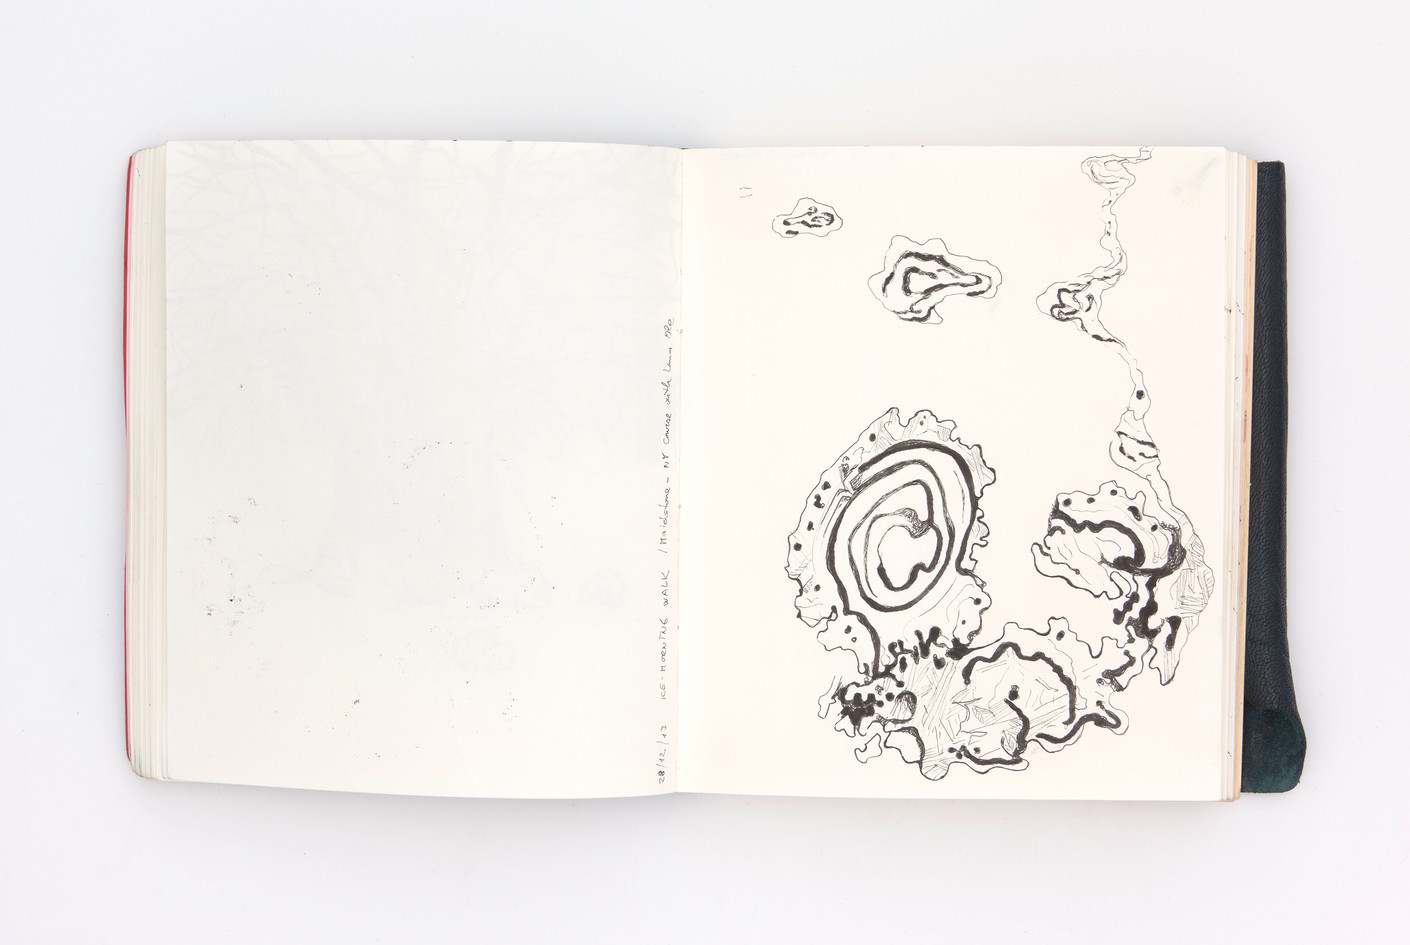 LargerBook-033.jpg